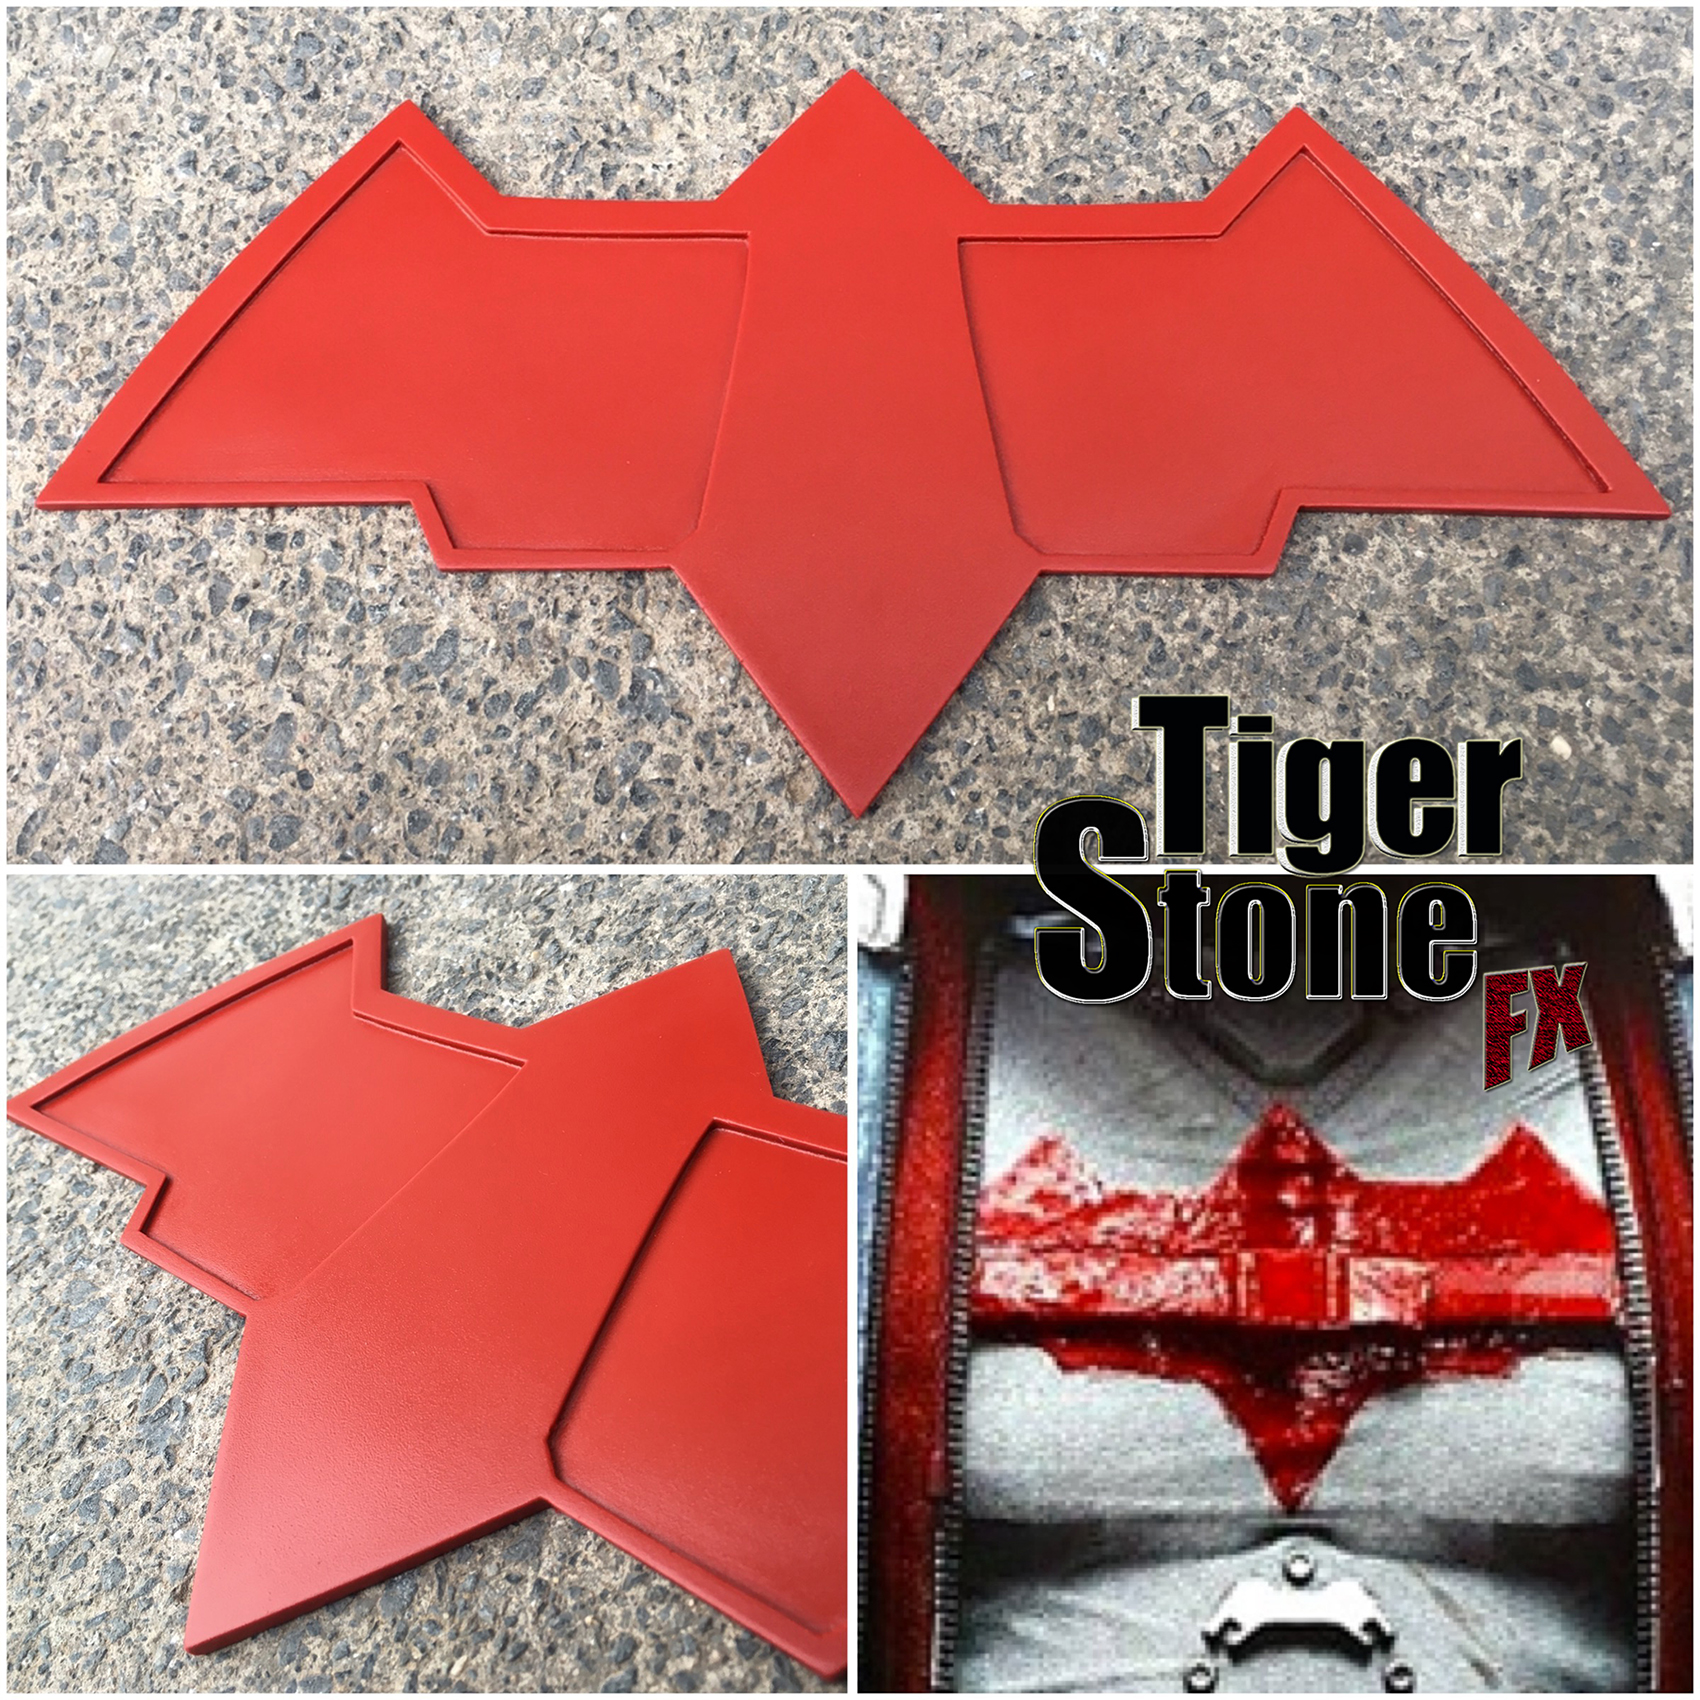 Arkham Knight Red Hood Inspired Tiger Stone Fx